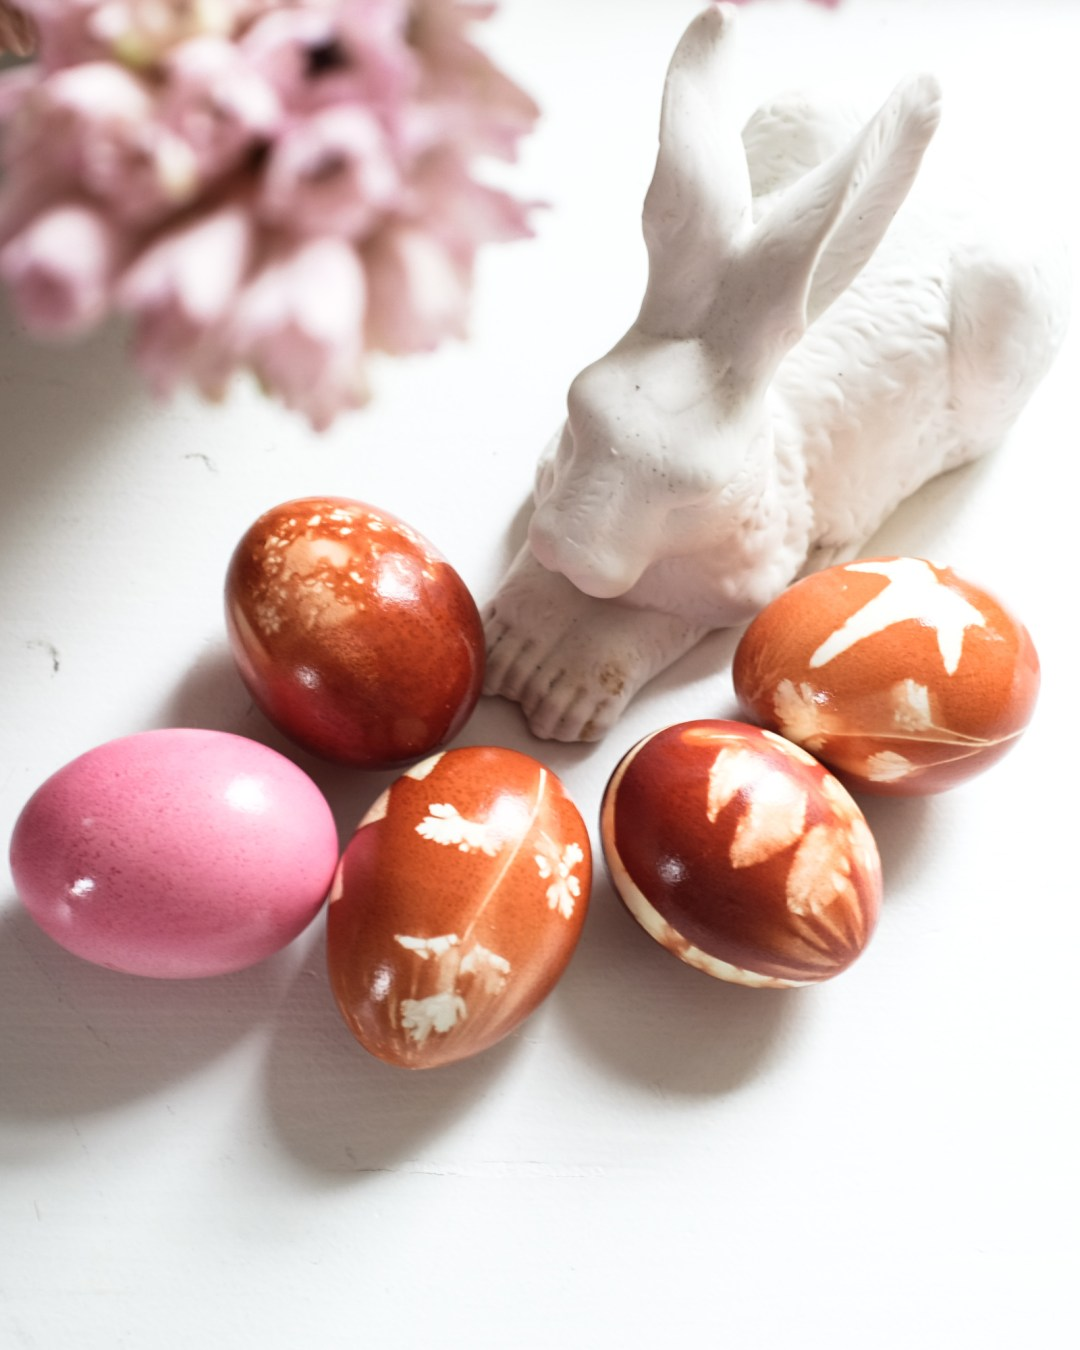 inastil, Ü50Blogger, Ostern, Ostereier färben, DIY Osterdekoration, Frühling, Osterhase, Ostertradition, Easter2018, Easterbunny-4